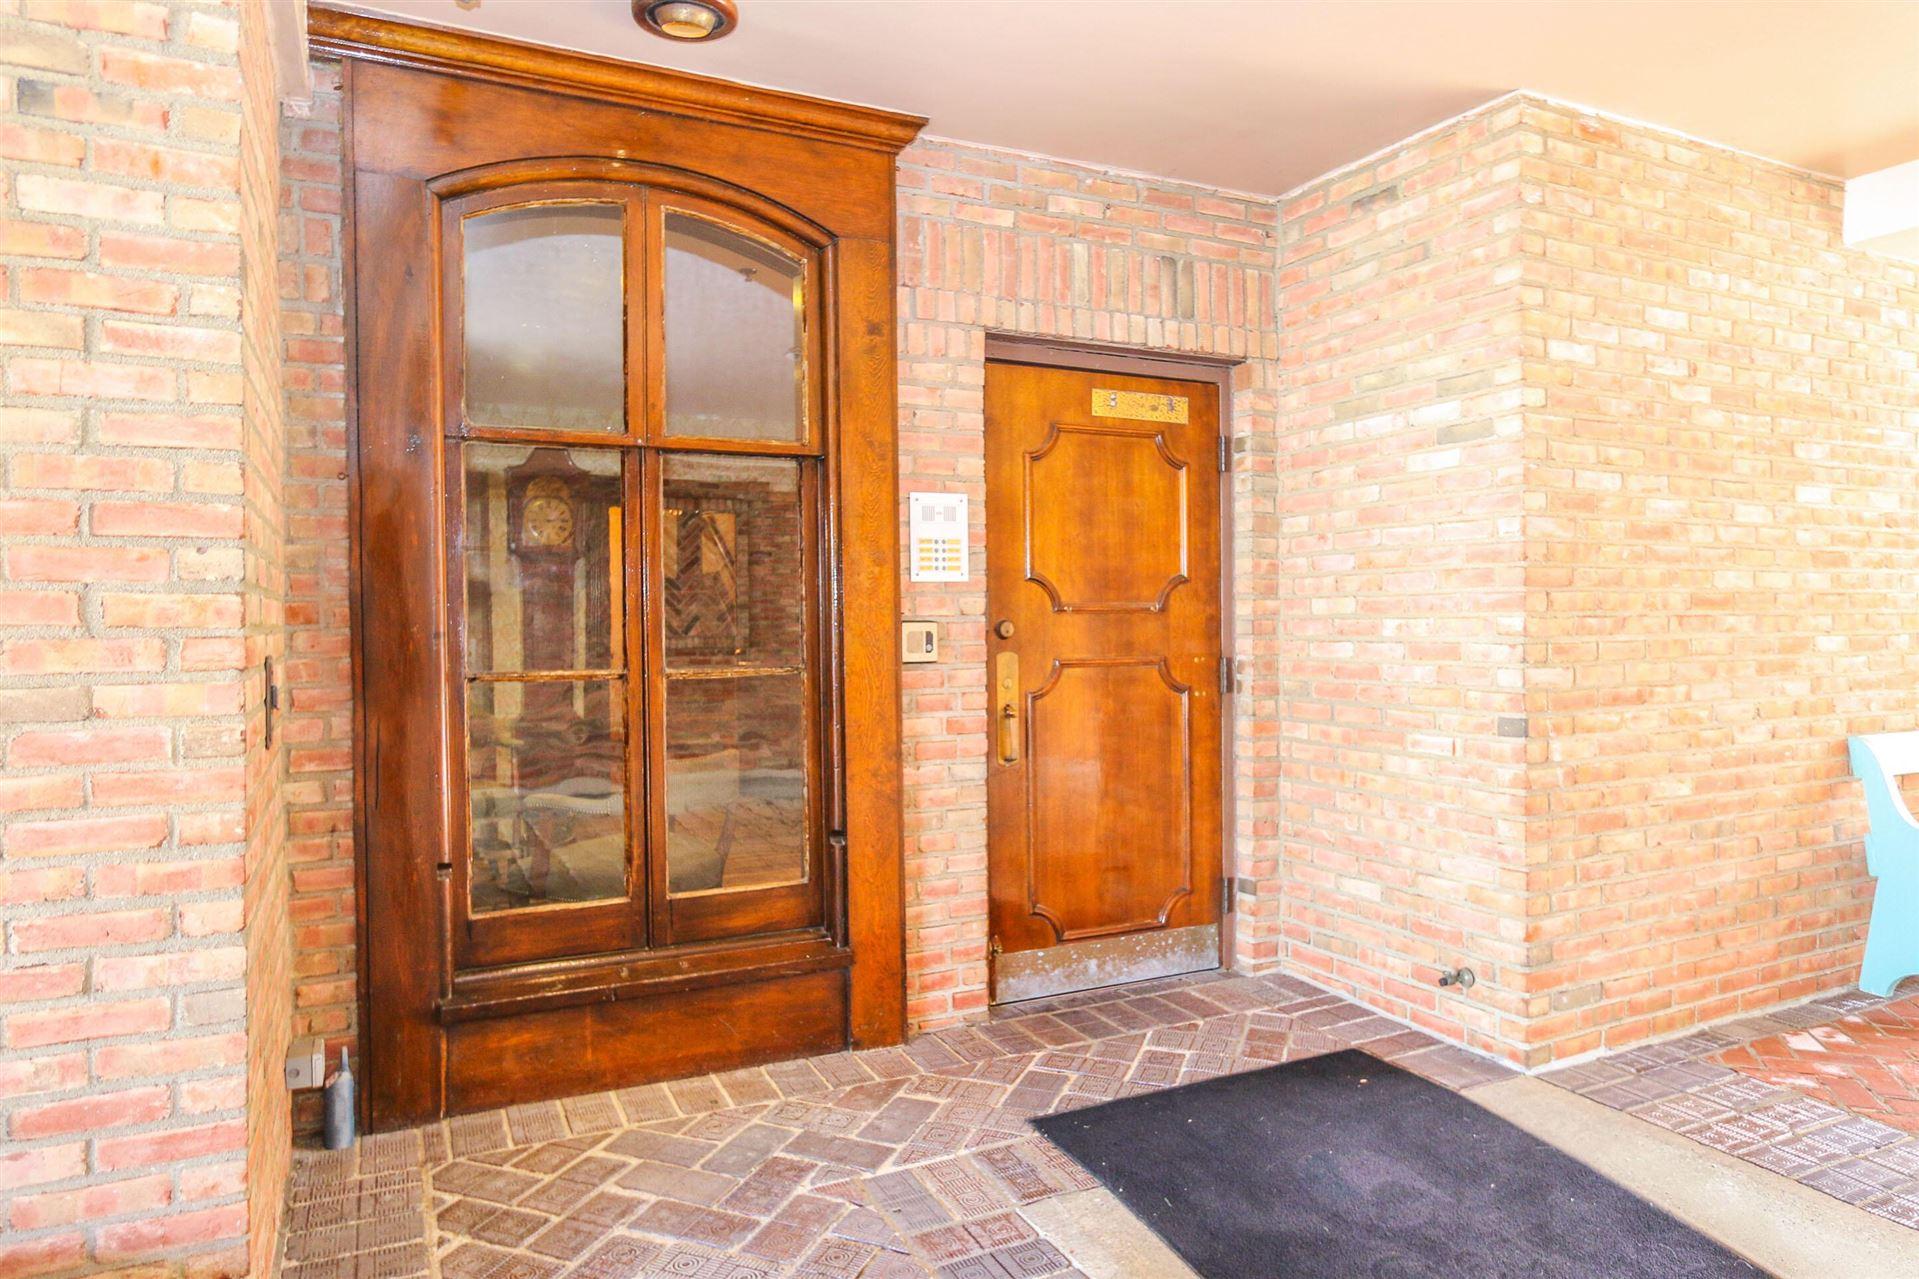 Photo of 649 N High Street #202, Worthington, OH 43085 (MLS # 221036156)